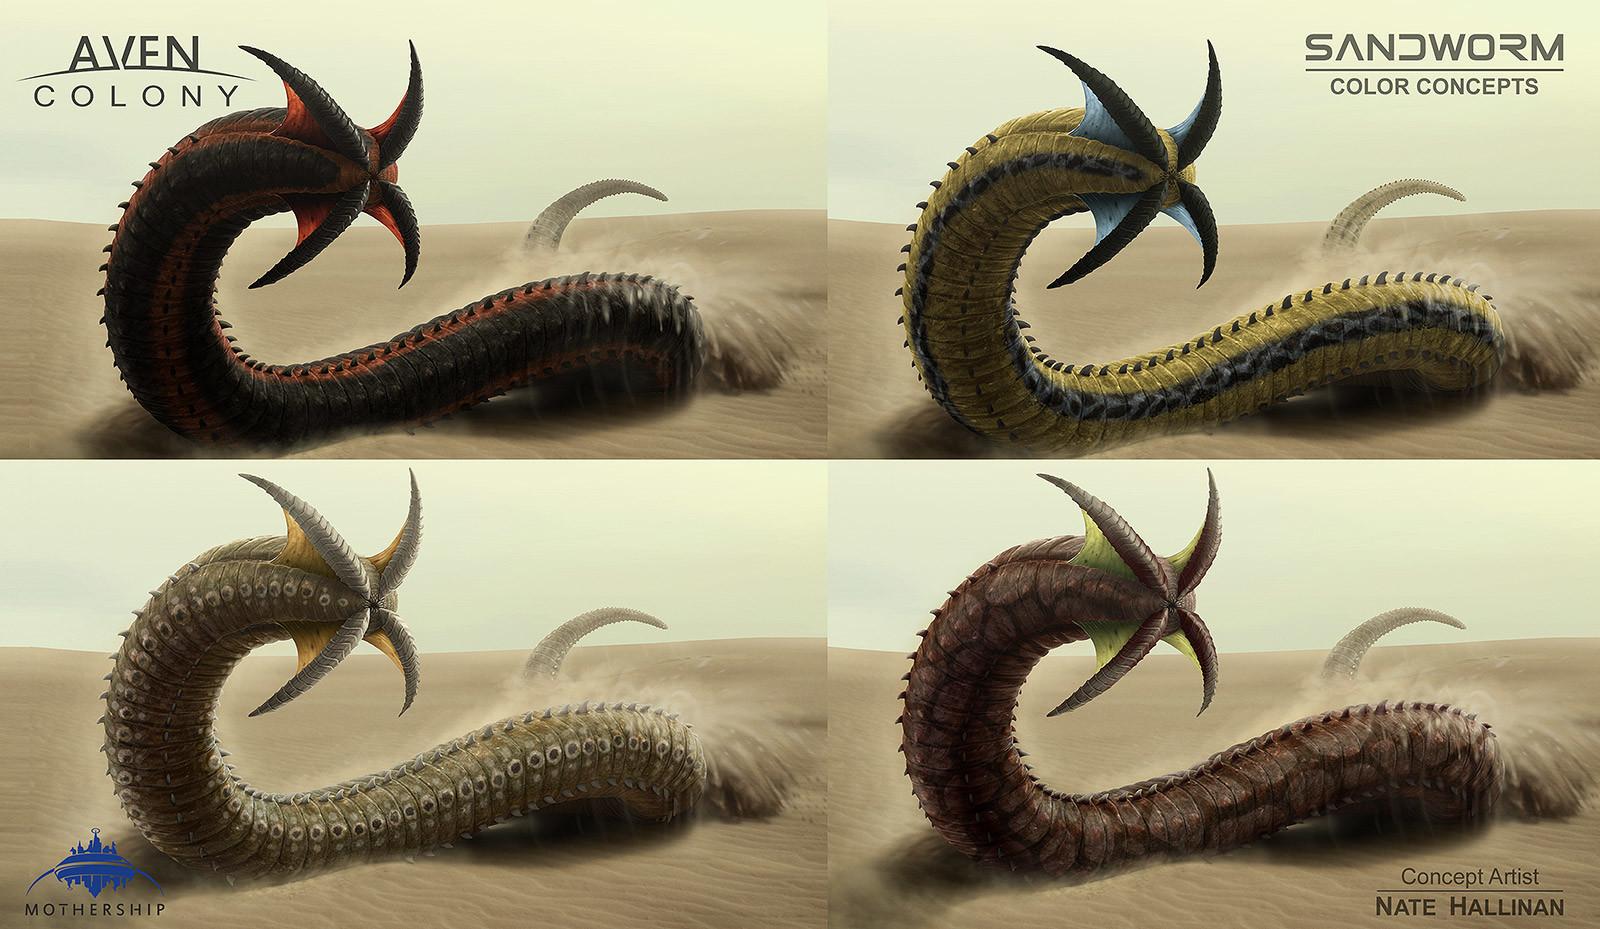 Nate hallinan ac alien sandworm colors